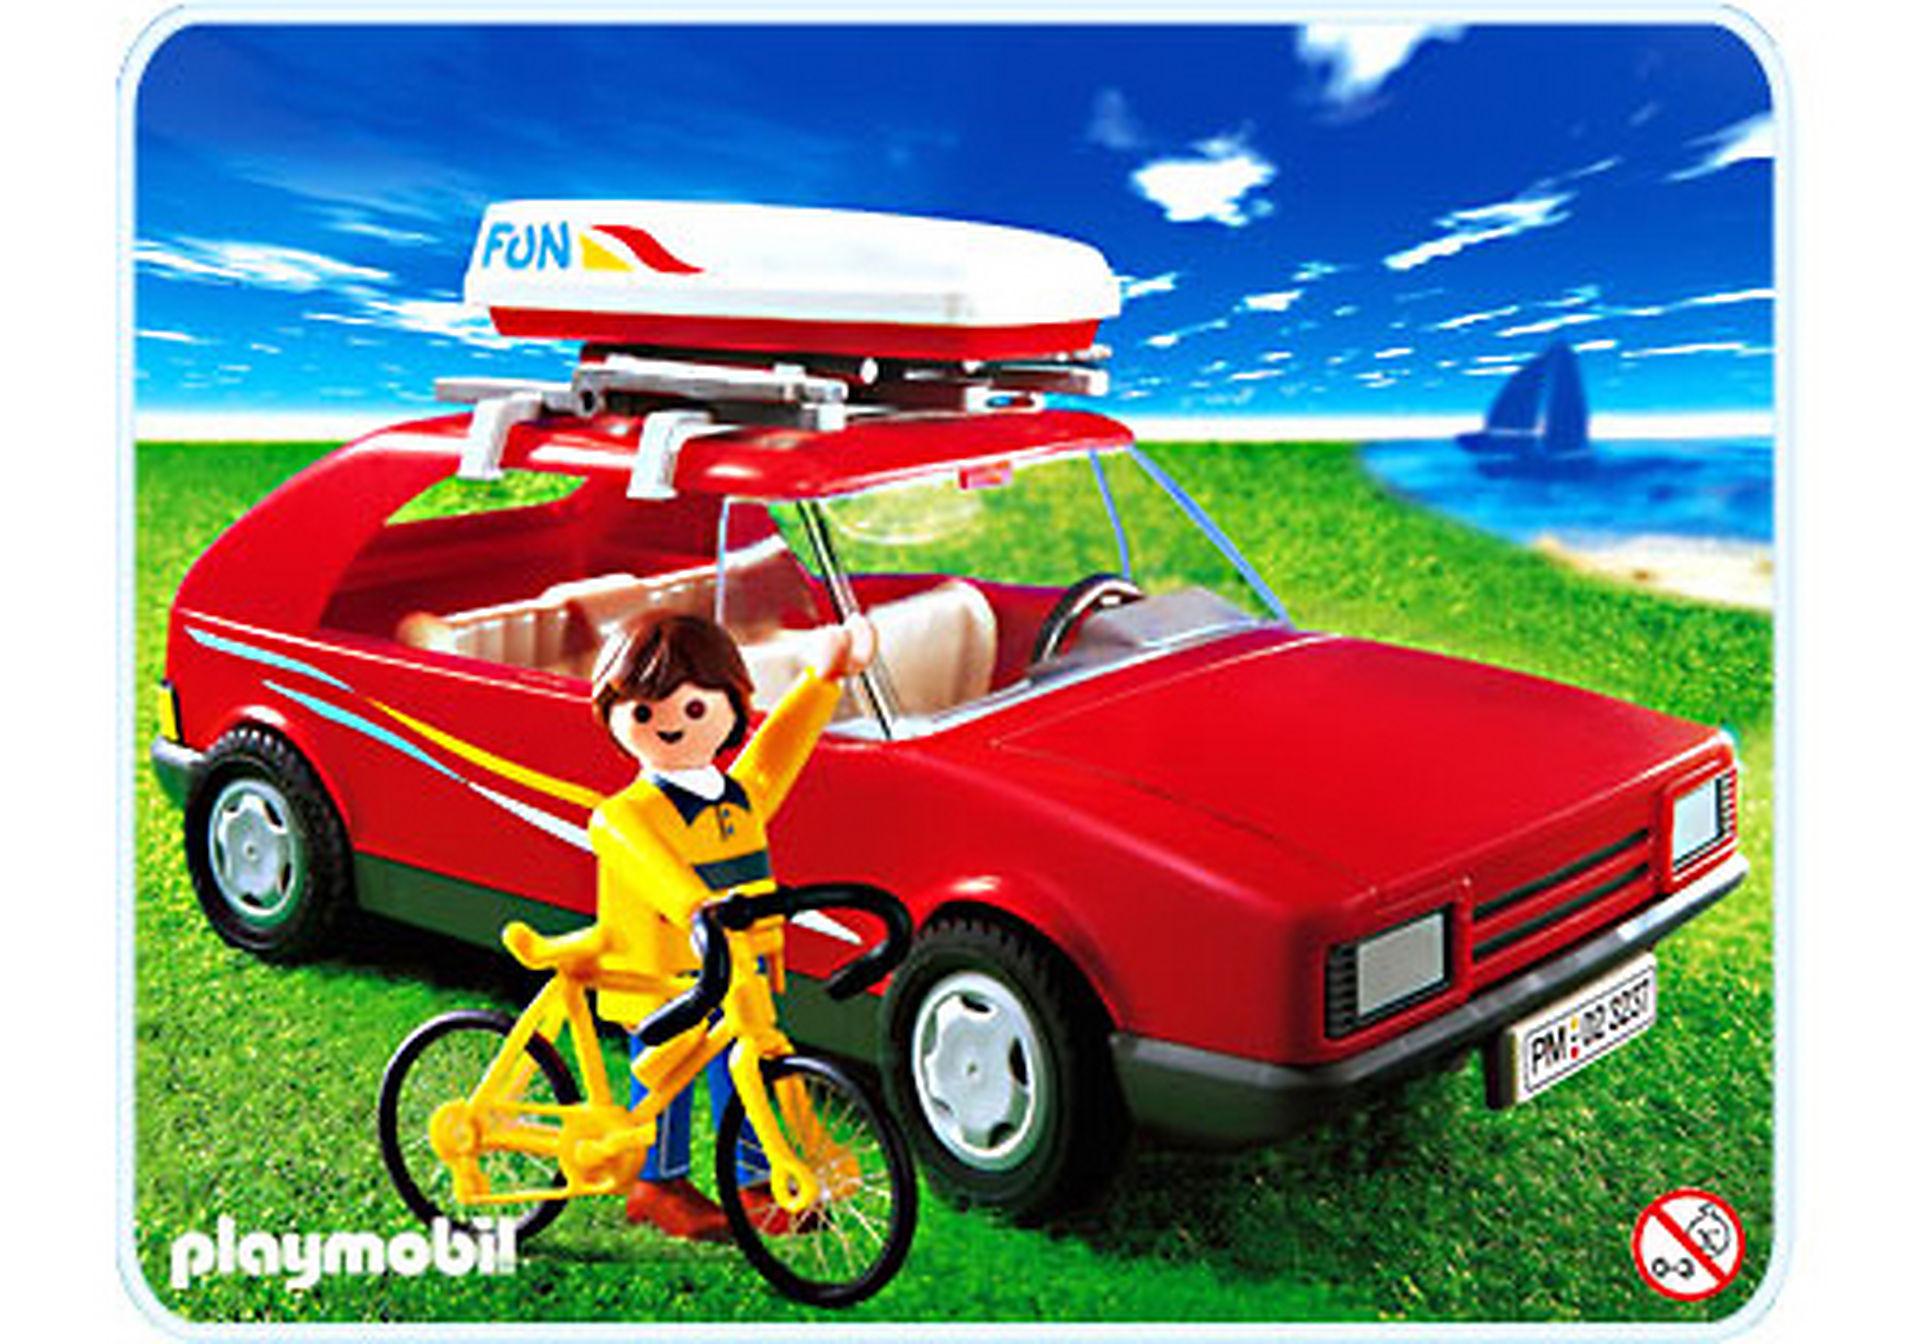 http://media.playmobil.com/i/playmobil/3237-B_product_detail/PKW